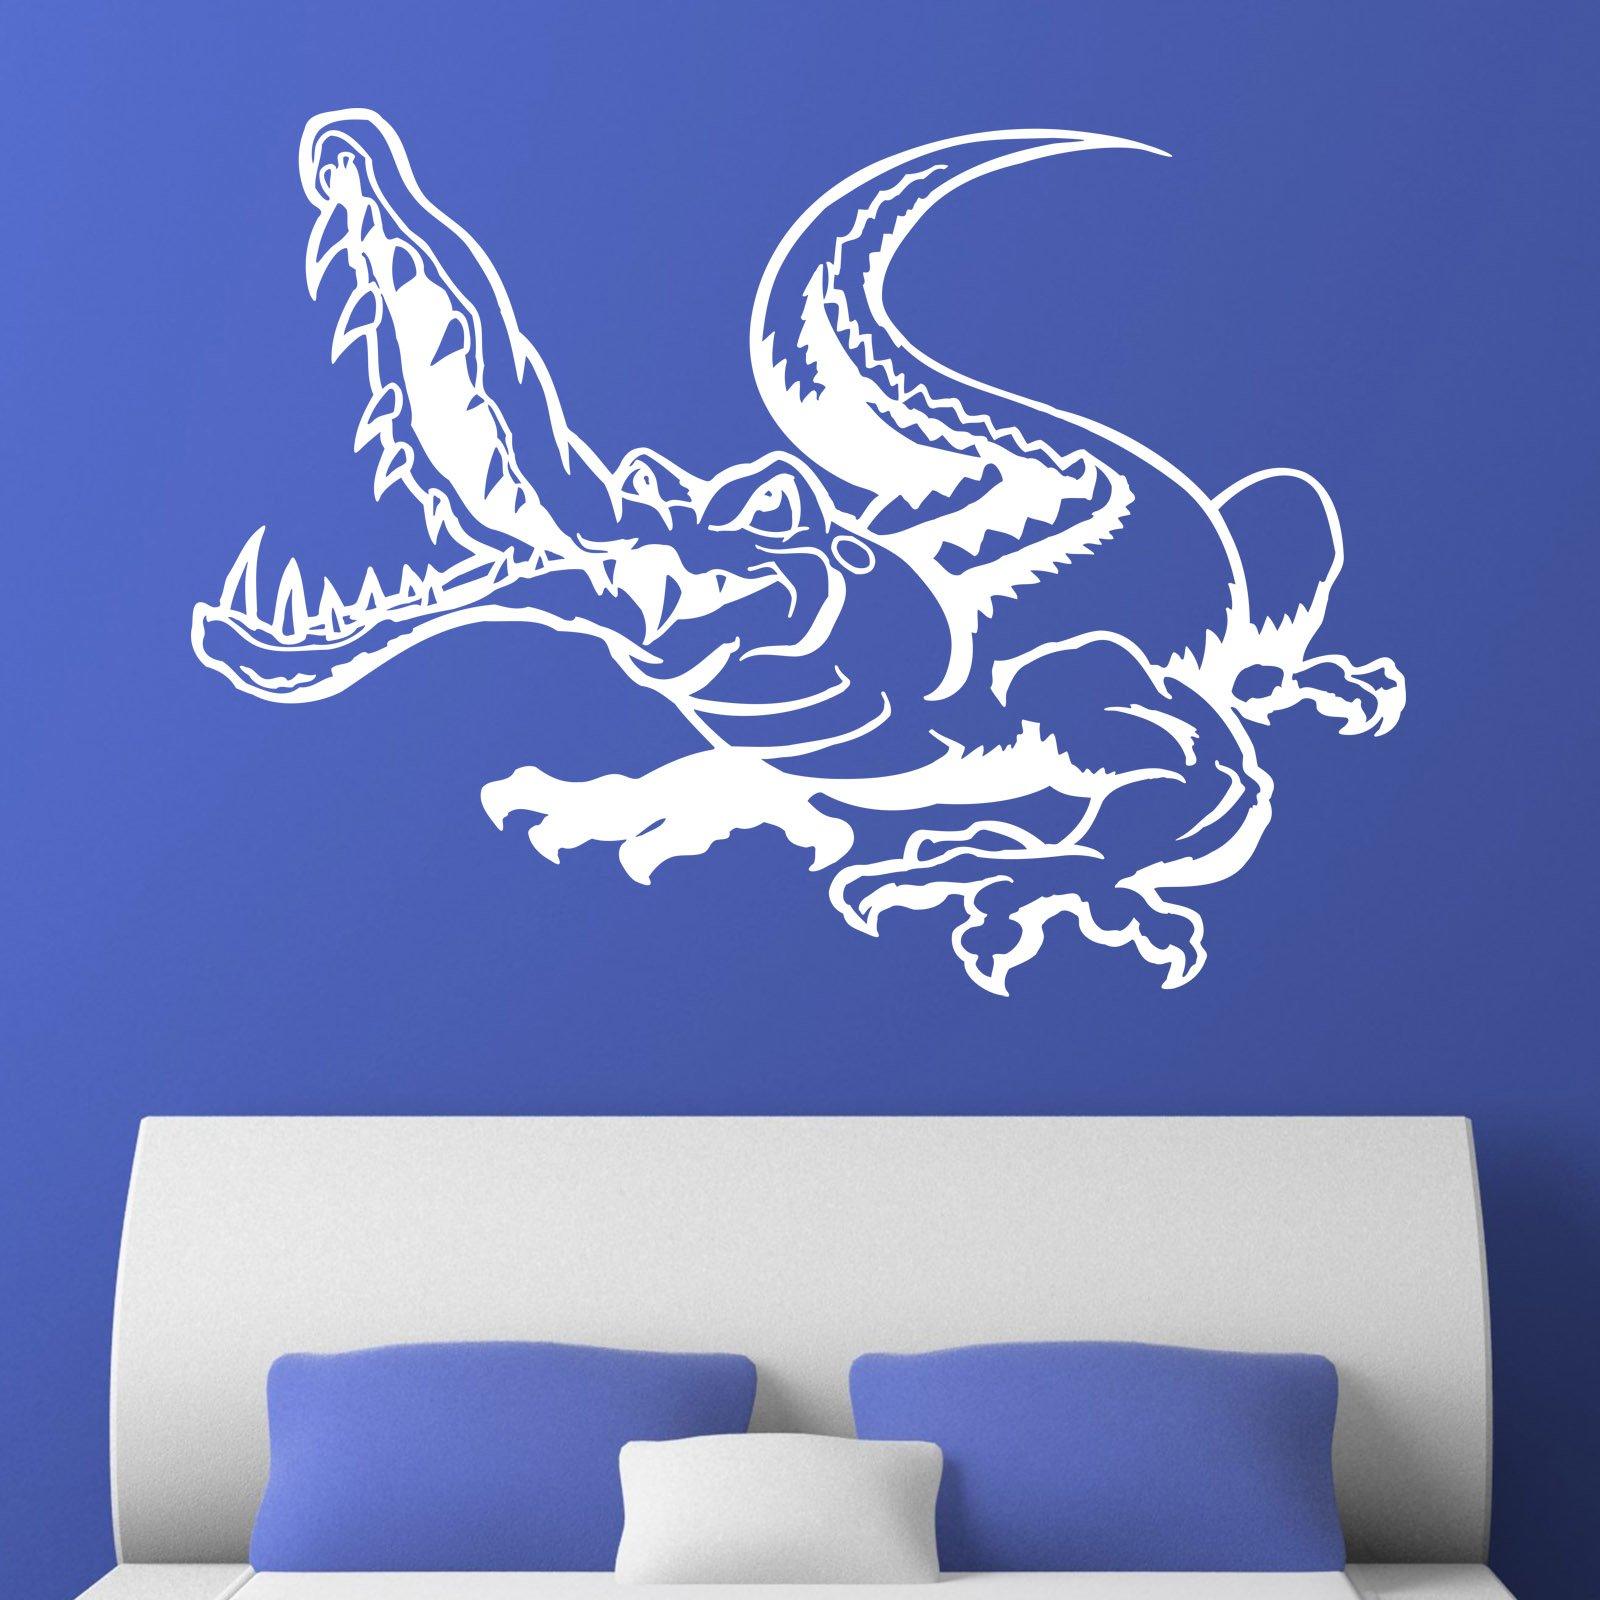 Alligator Crocodile Kids Wall Sticker - World of Wall Stickers